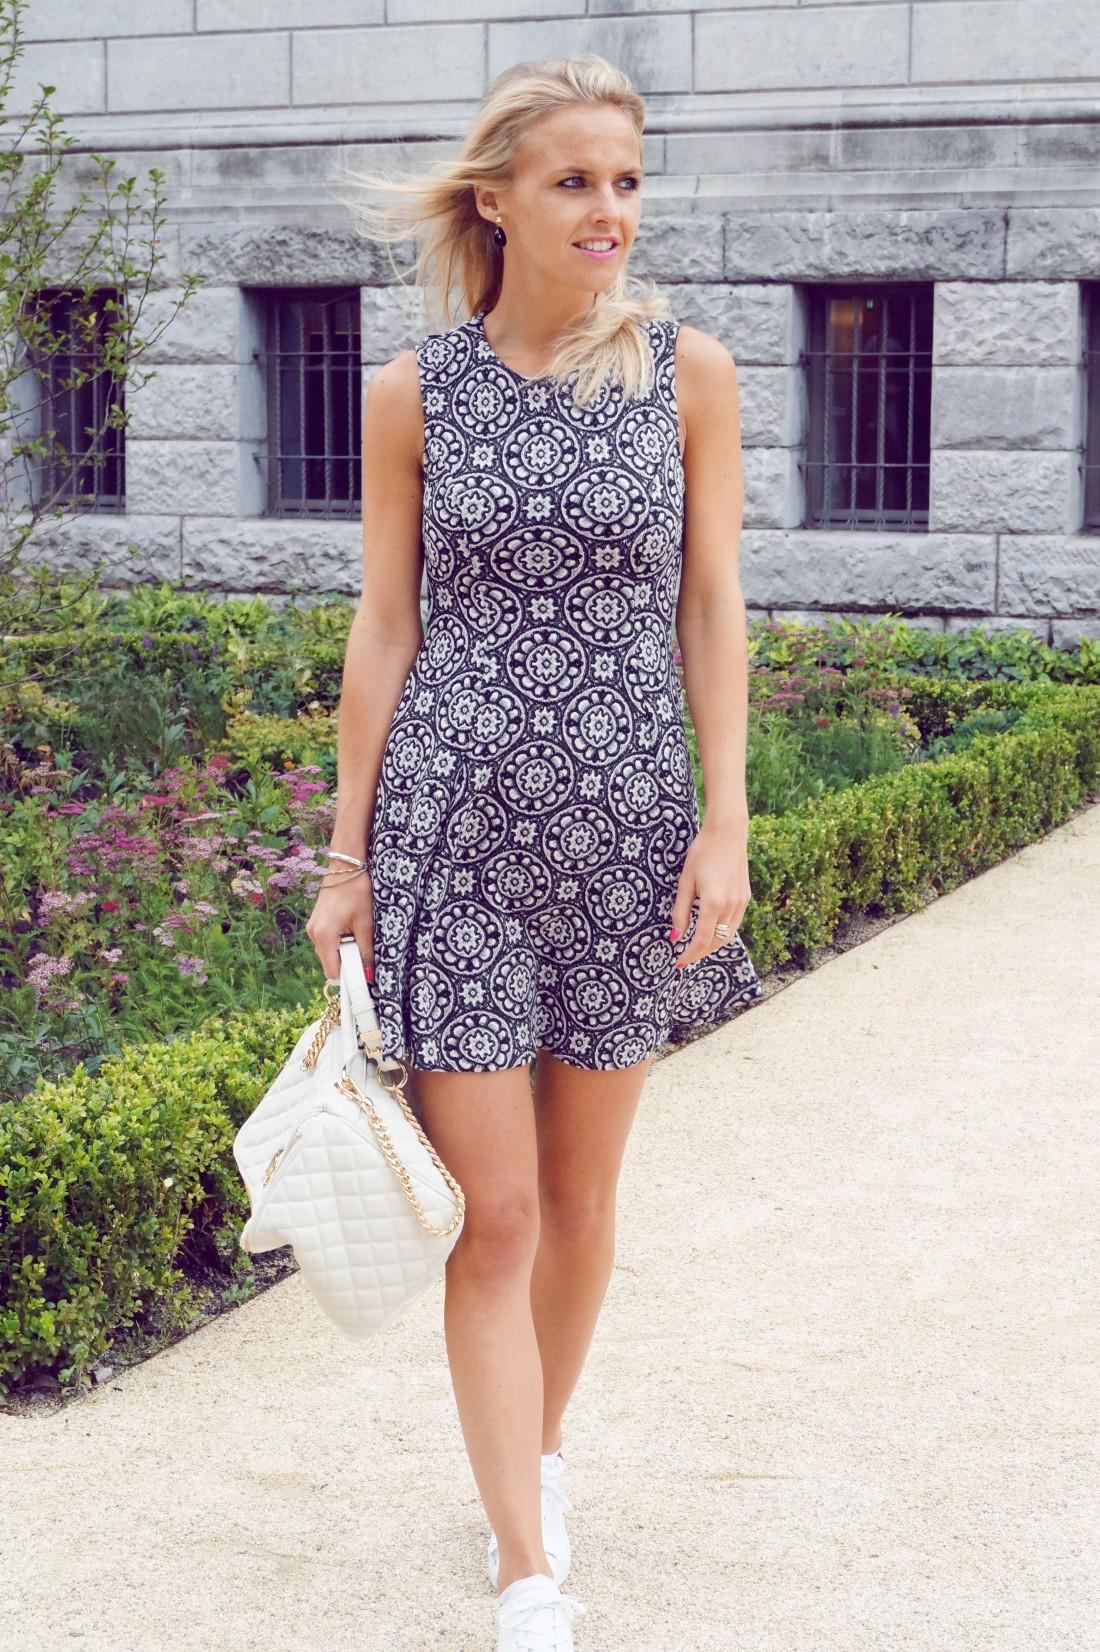 Bag at You - Fashion blog - Love Moschino - Shoulderbag - Zara dress - Amsterdam Streetstyle - Italian fashion